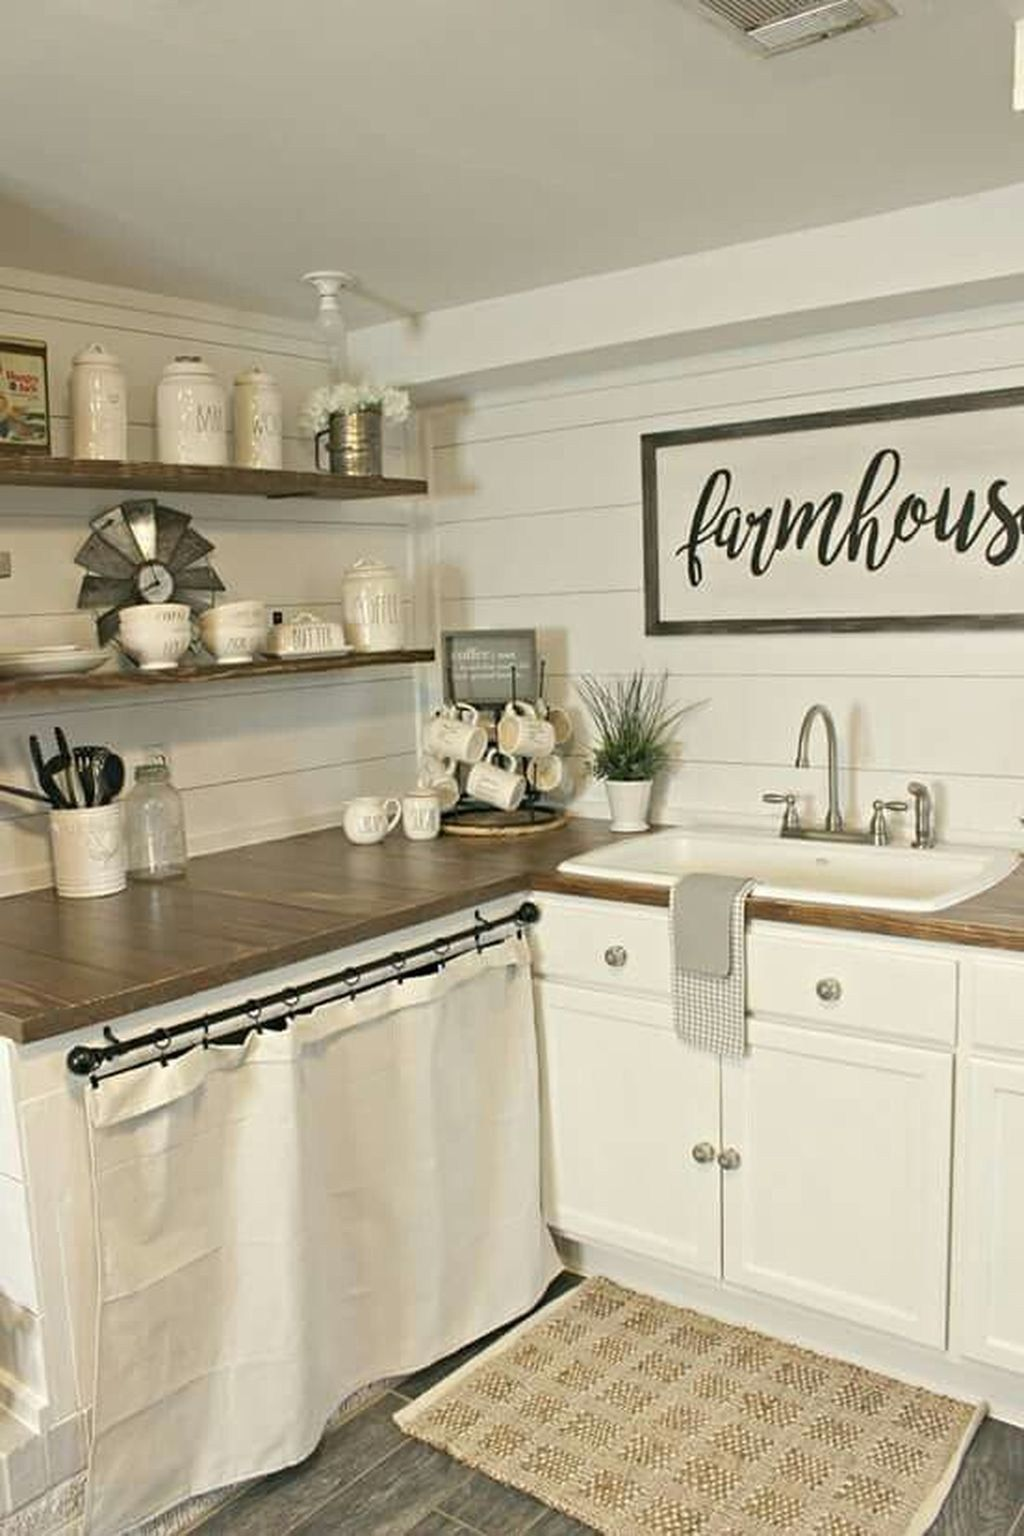 35 Stunning Small Farmhouse Kitchen Decor Ideas Best For Your Farmhouse Design Trendehouse Farmhouse Kitchen Inspiration Tuscan Kitchen Kitchen Design Small